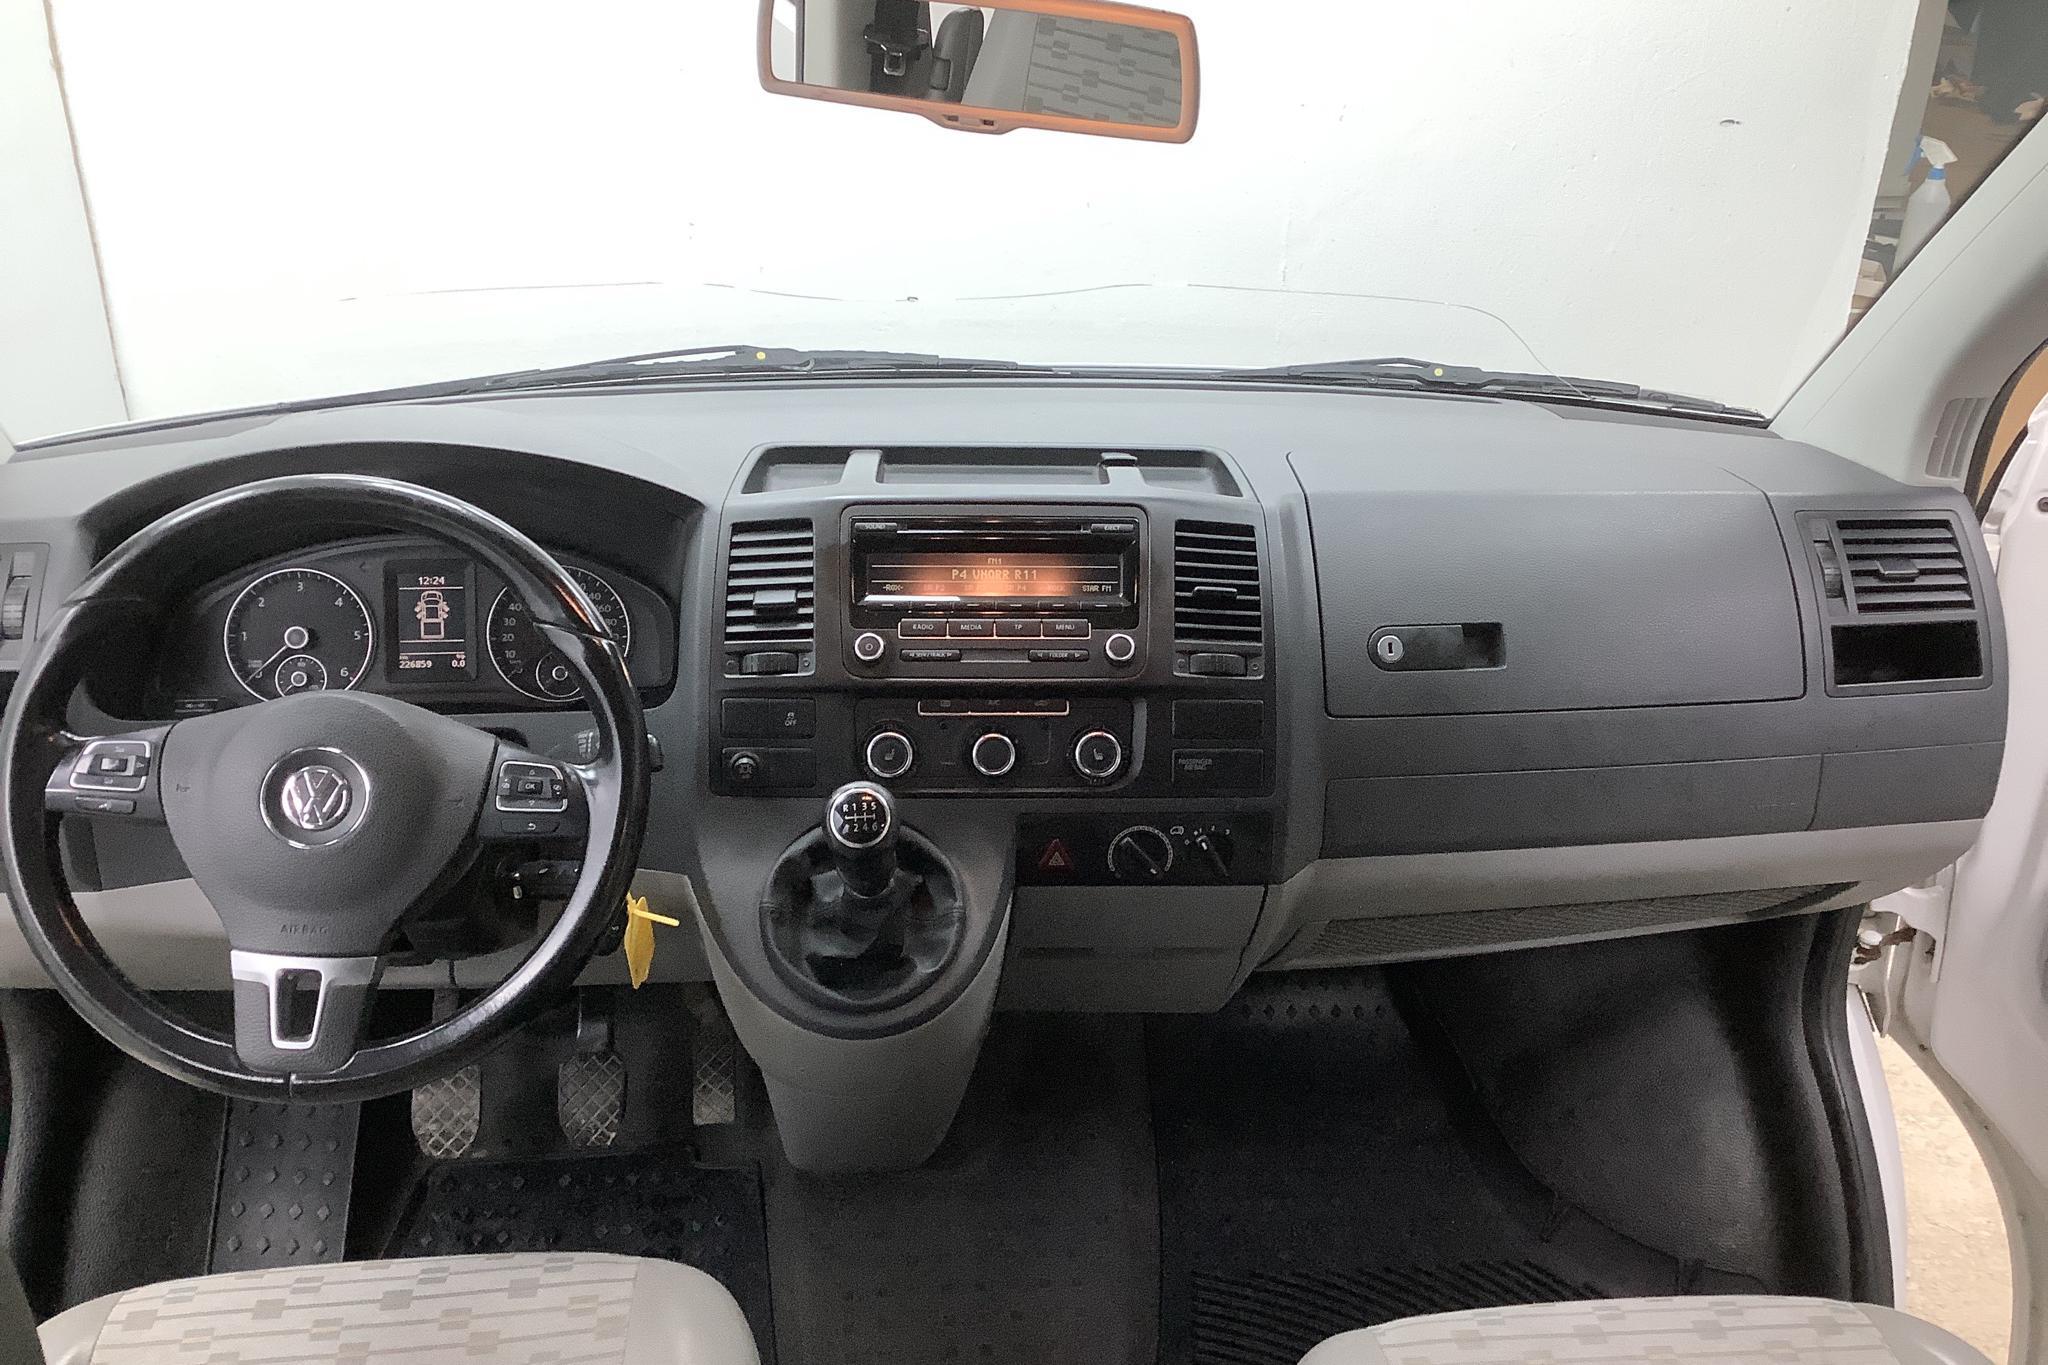 VW Transporter T5 2.0 BiTDI Pickup 4MOTION (180hk) - 226 860 km - Manual - white - 2013